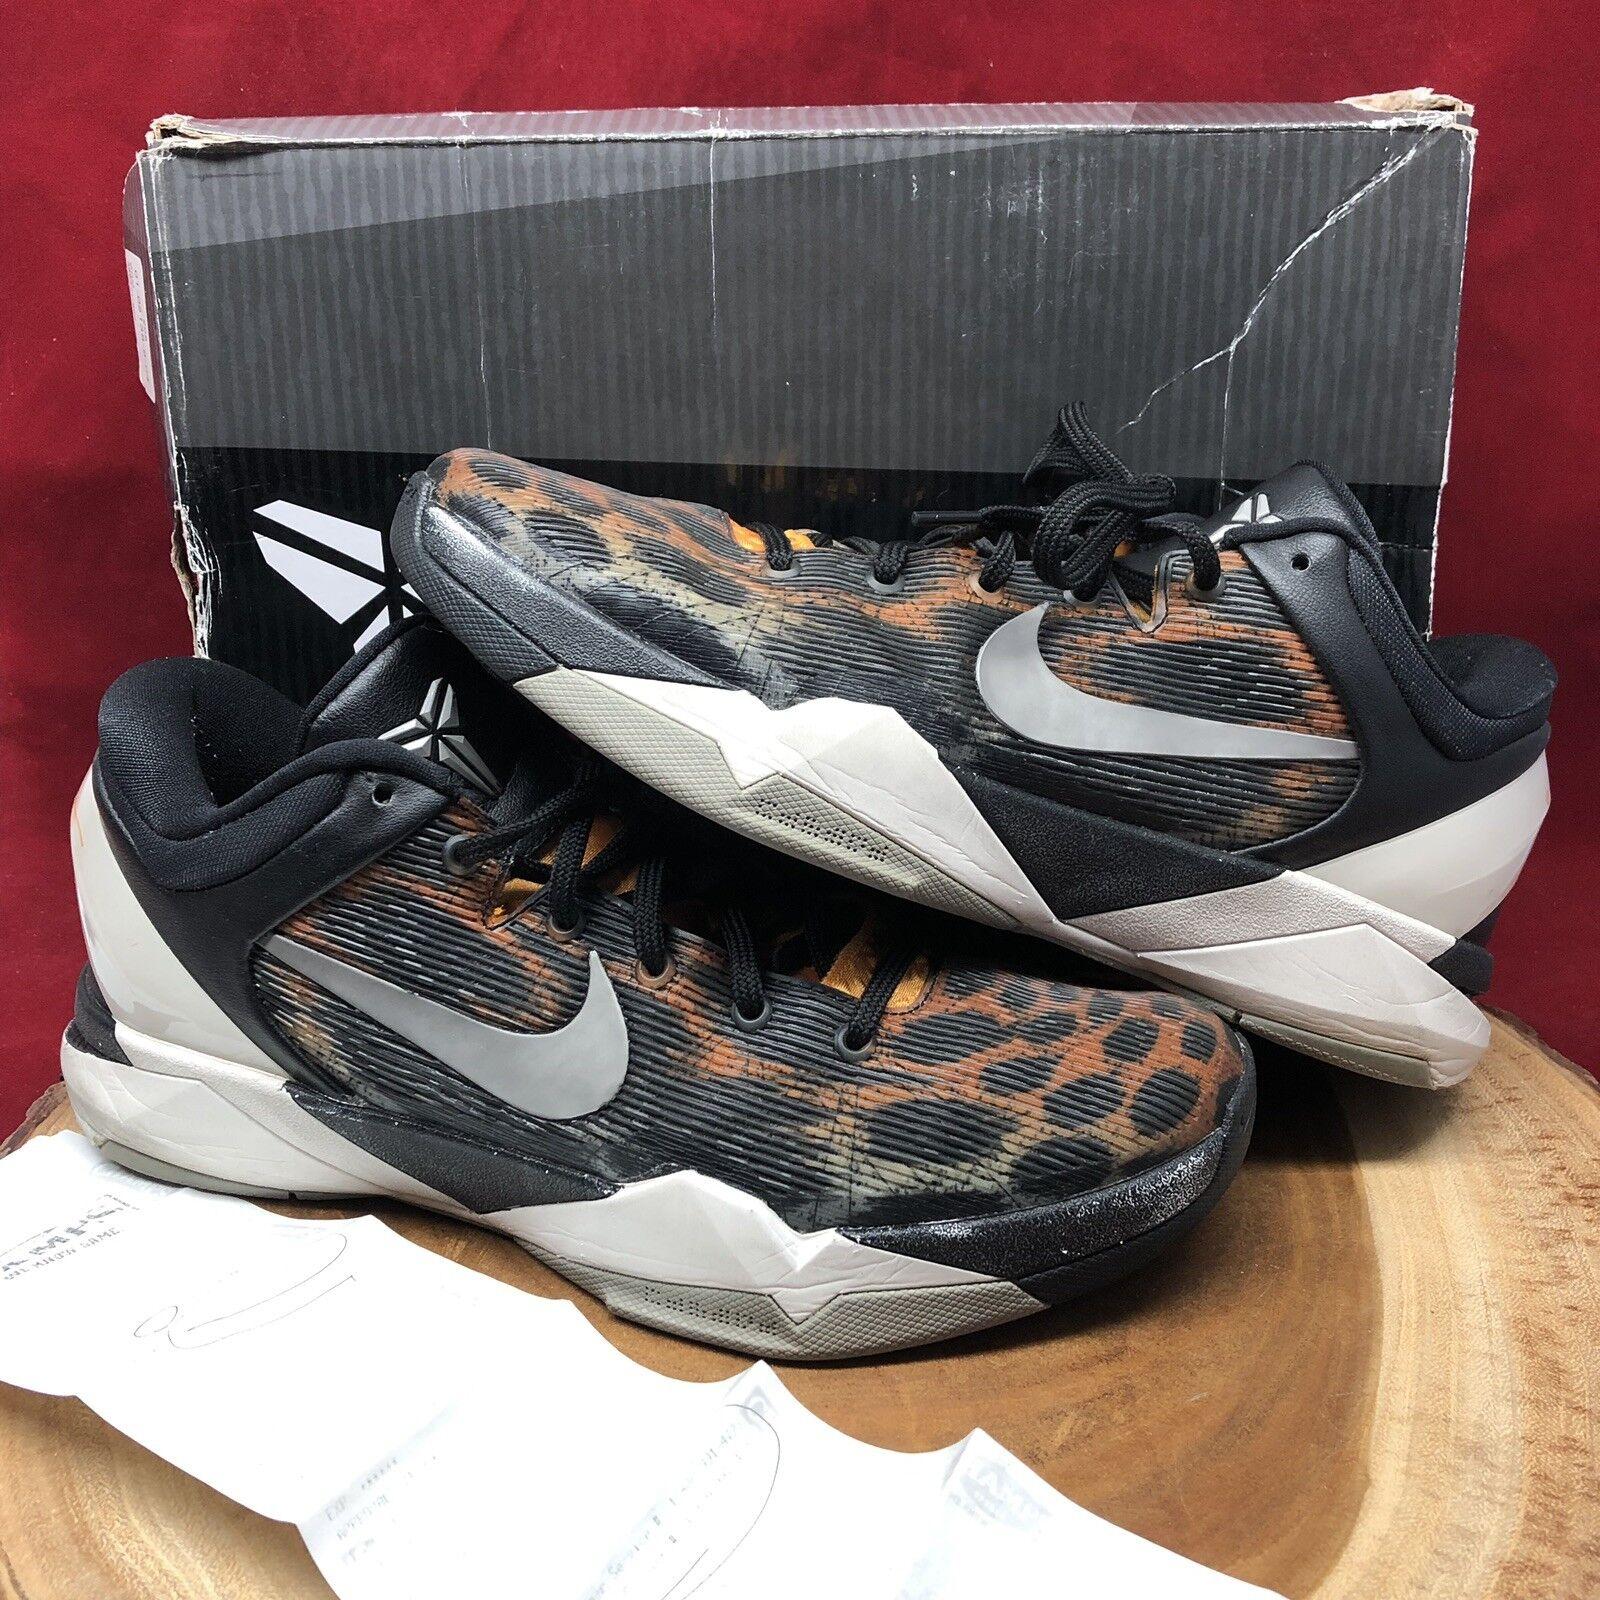 Nike Zoom Kobe VII System Cheetah Size 10 488371 800 Black VIII